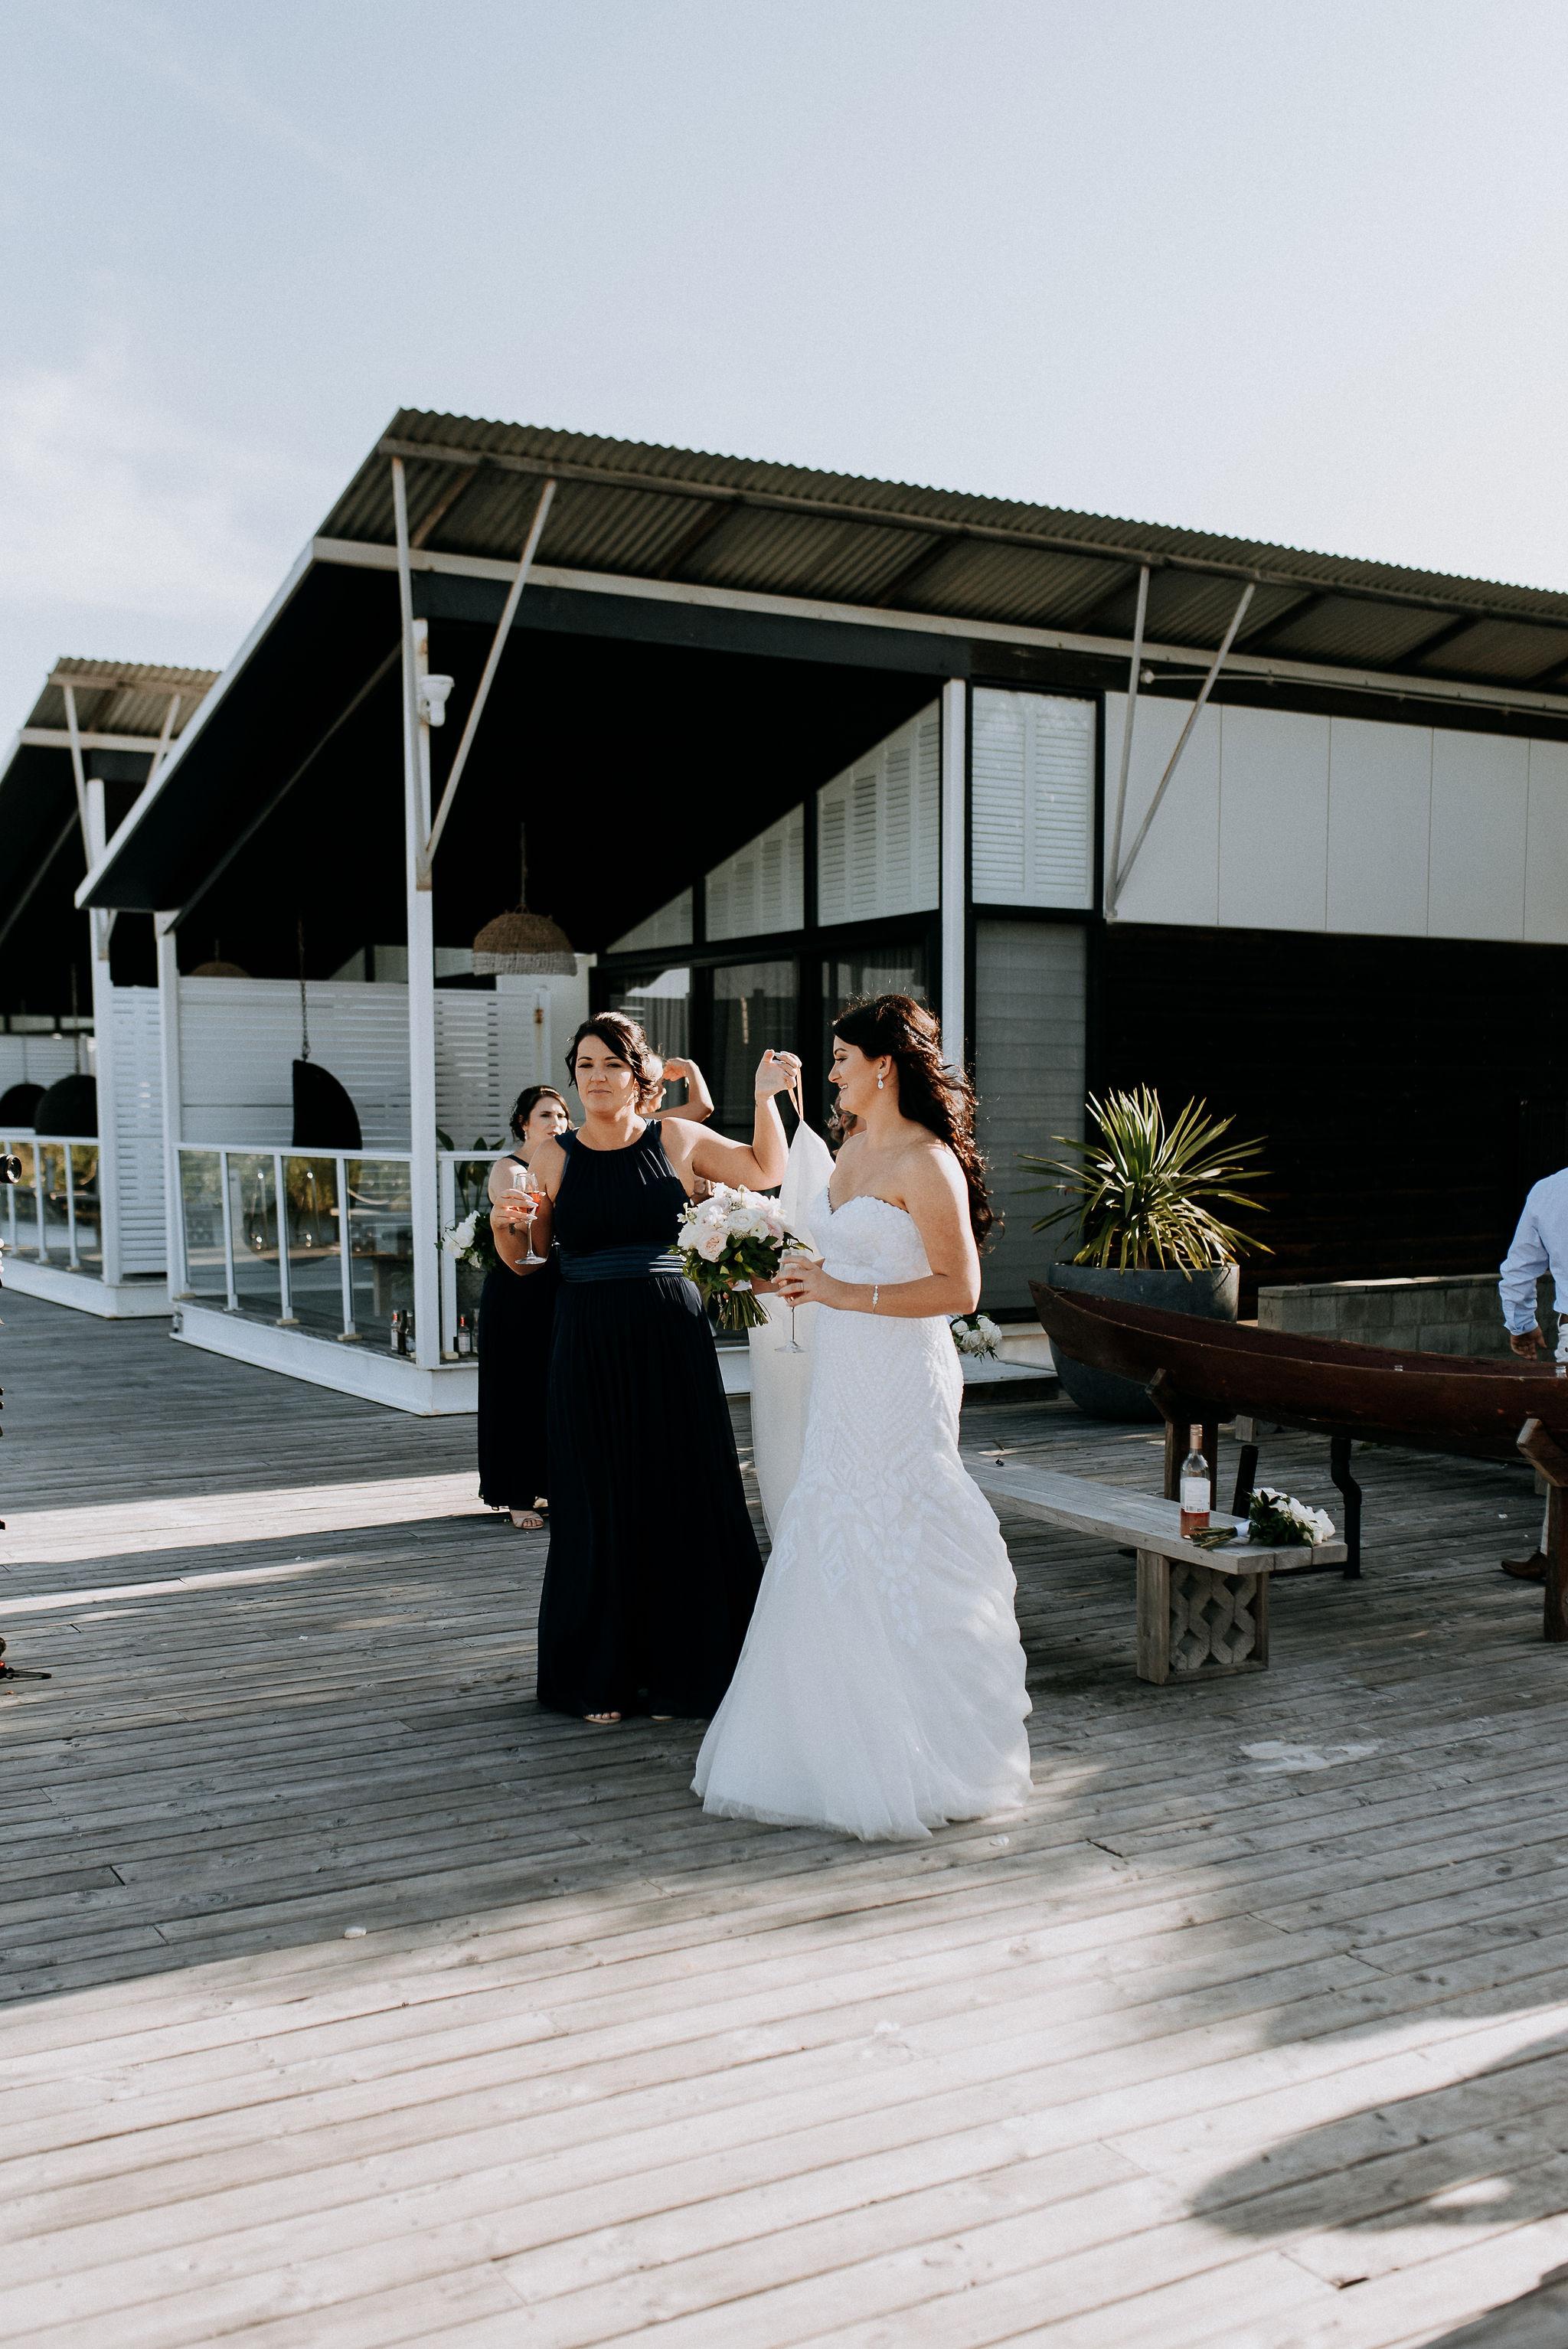 CAVES-BEACH-HOTEL-WEDDING-PATTEN-607.jpg